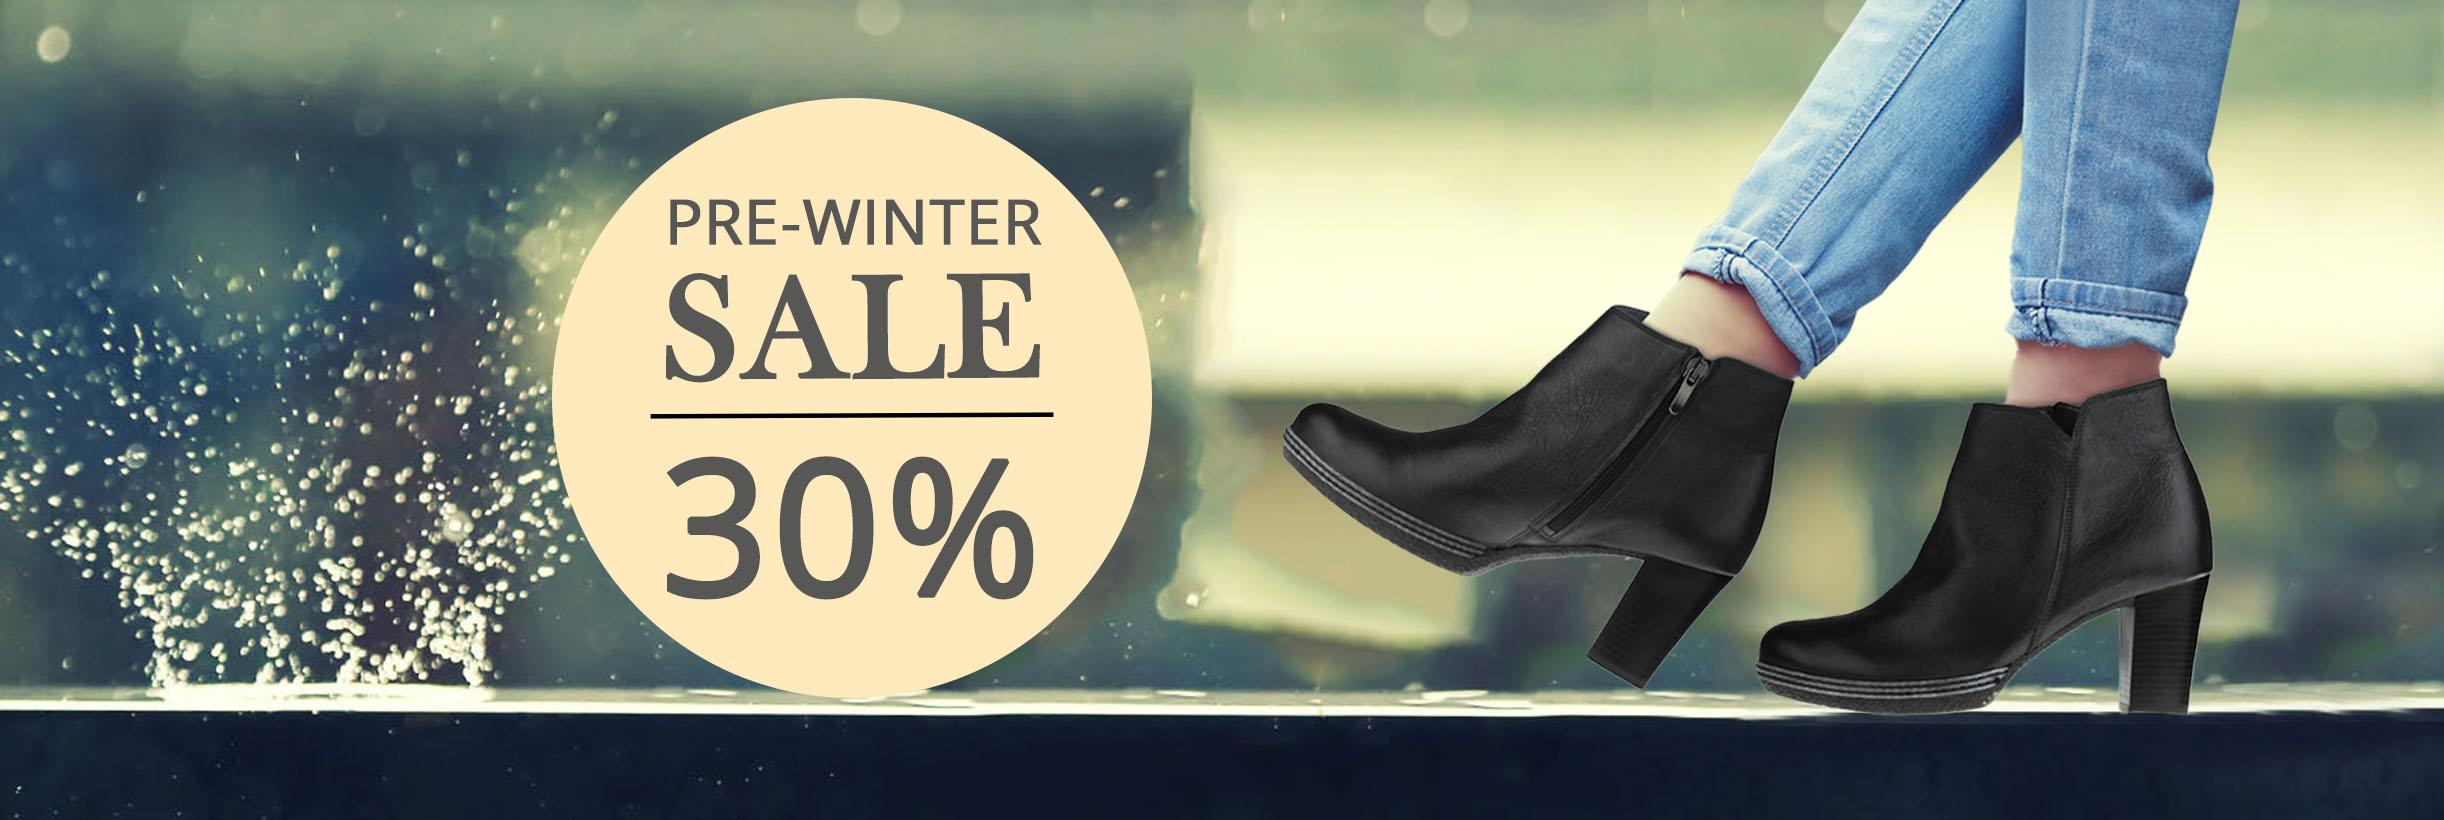 Kategoriebild Pre Winter Sale